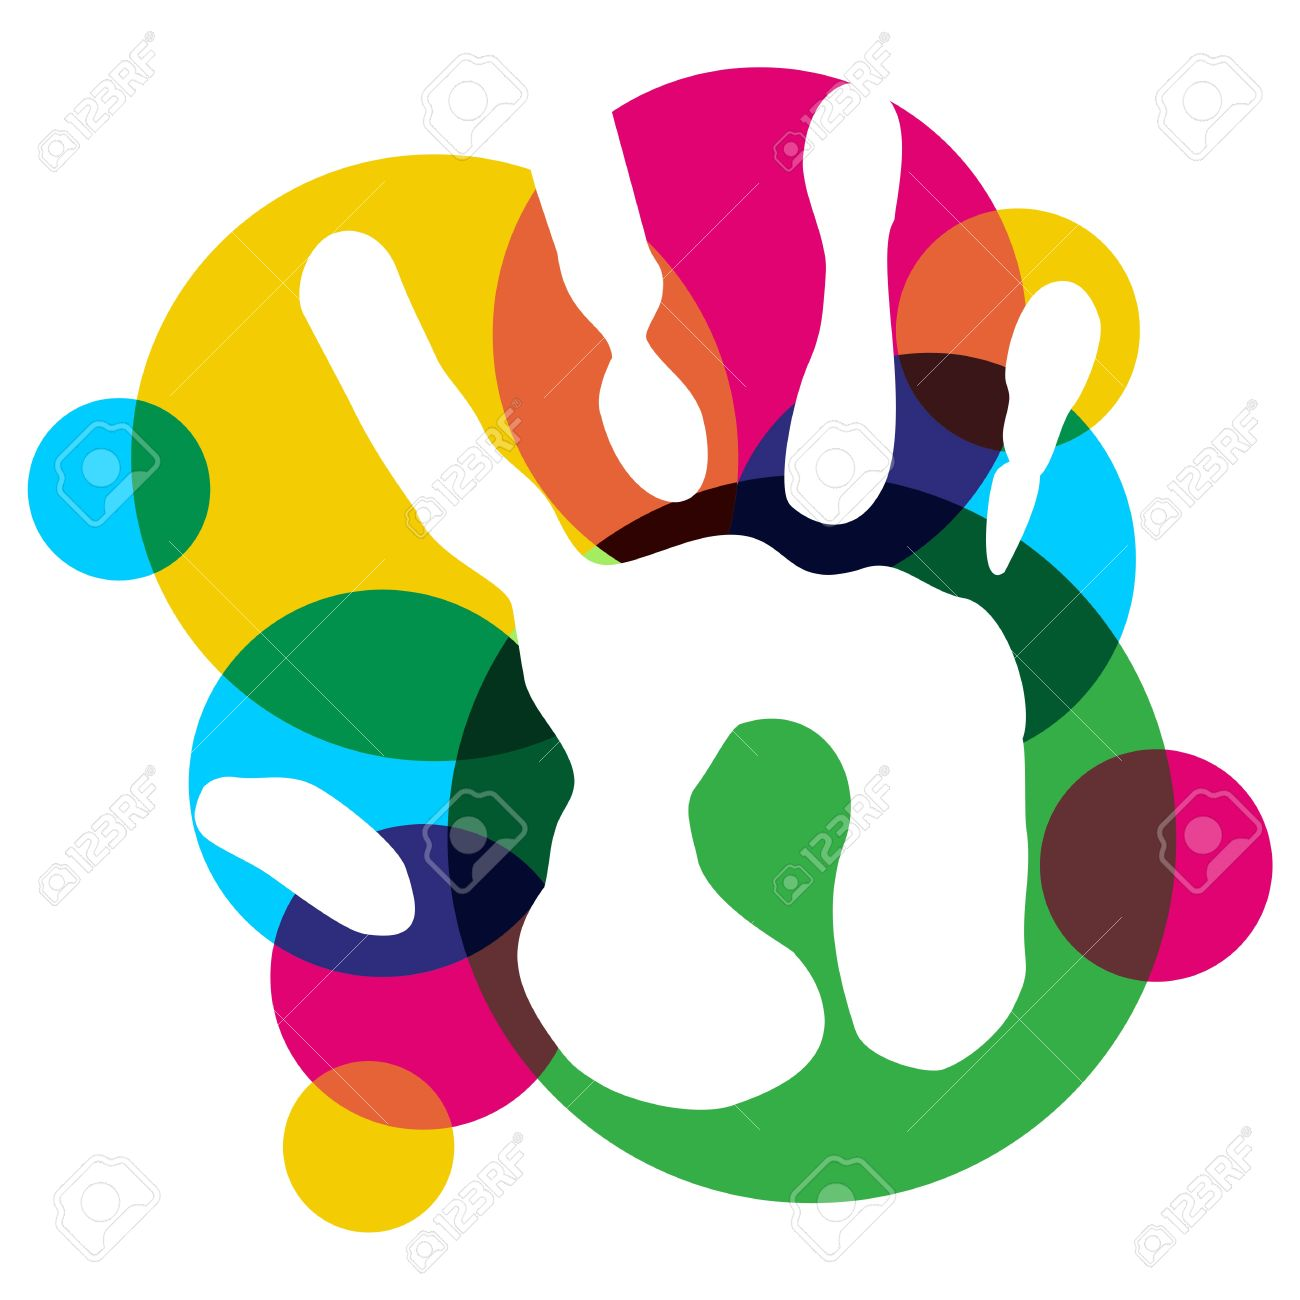 Multicolor Creative Diversity Single Hand Isolated Vector.